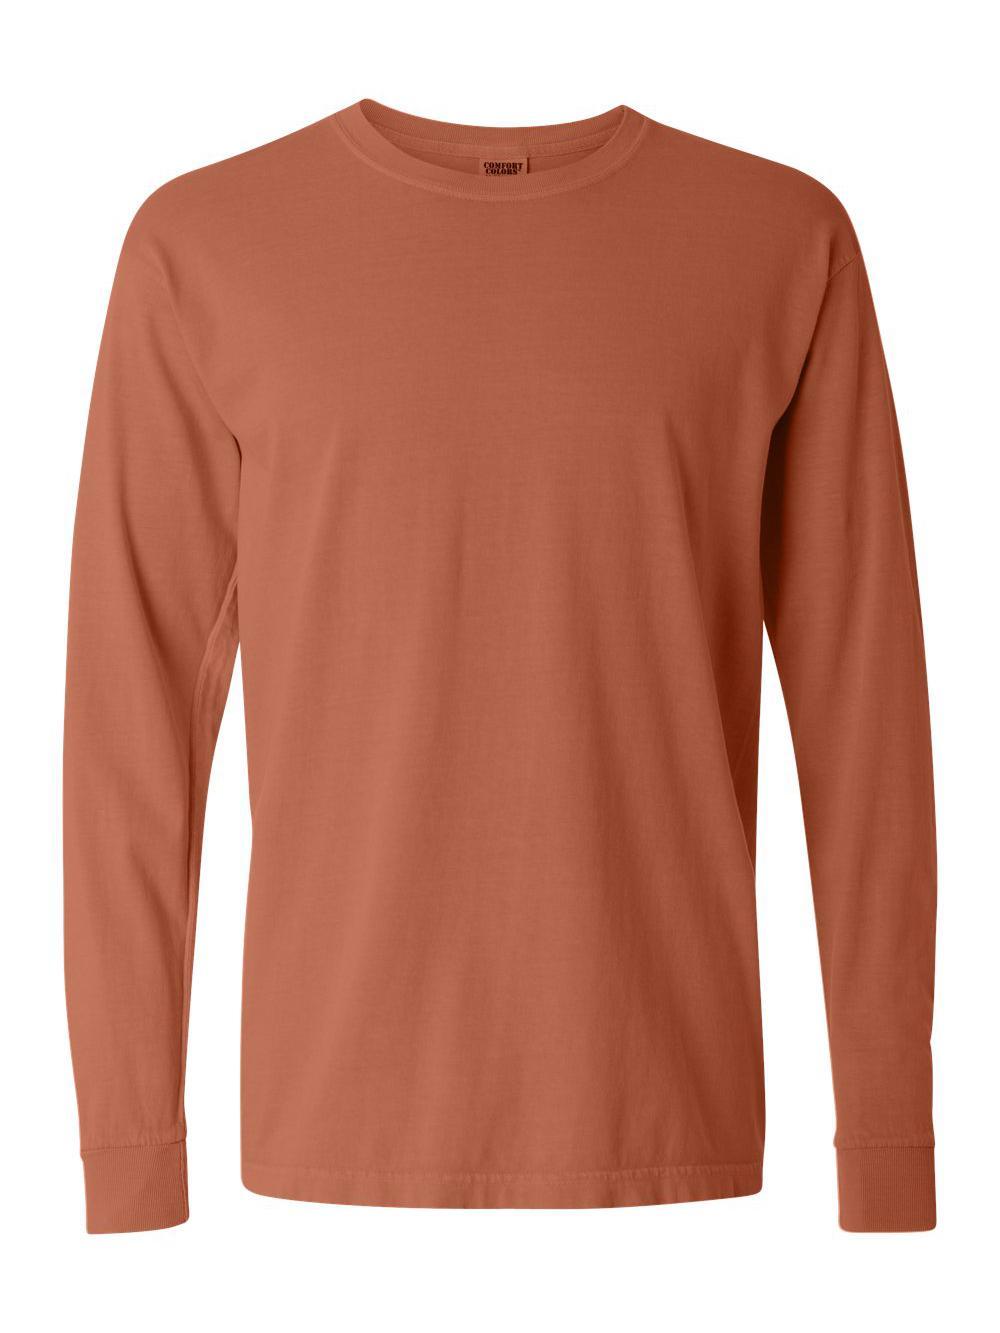 Comfort-Colors-Garment-Dyed-Heavyweight-Ringspun-Long-Sleeve-T-Shirt-6014 thumbnail 75